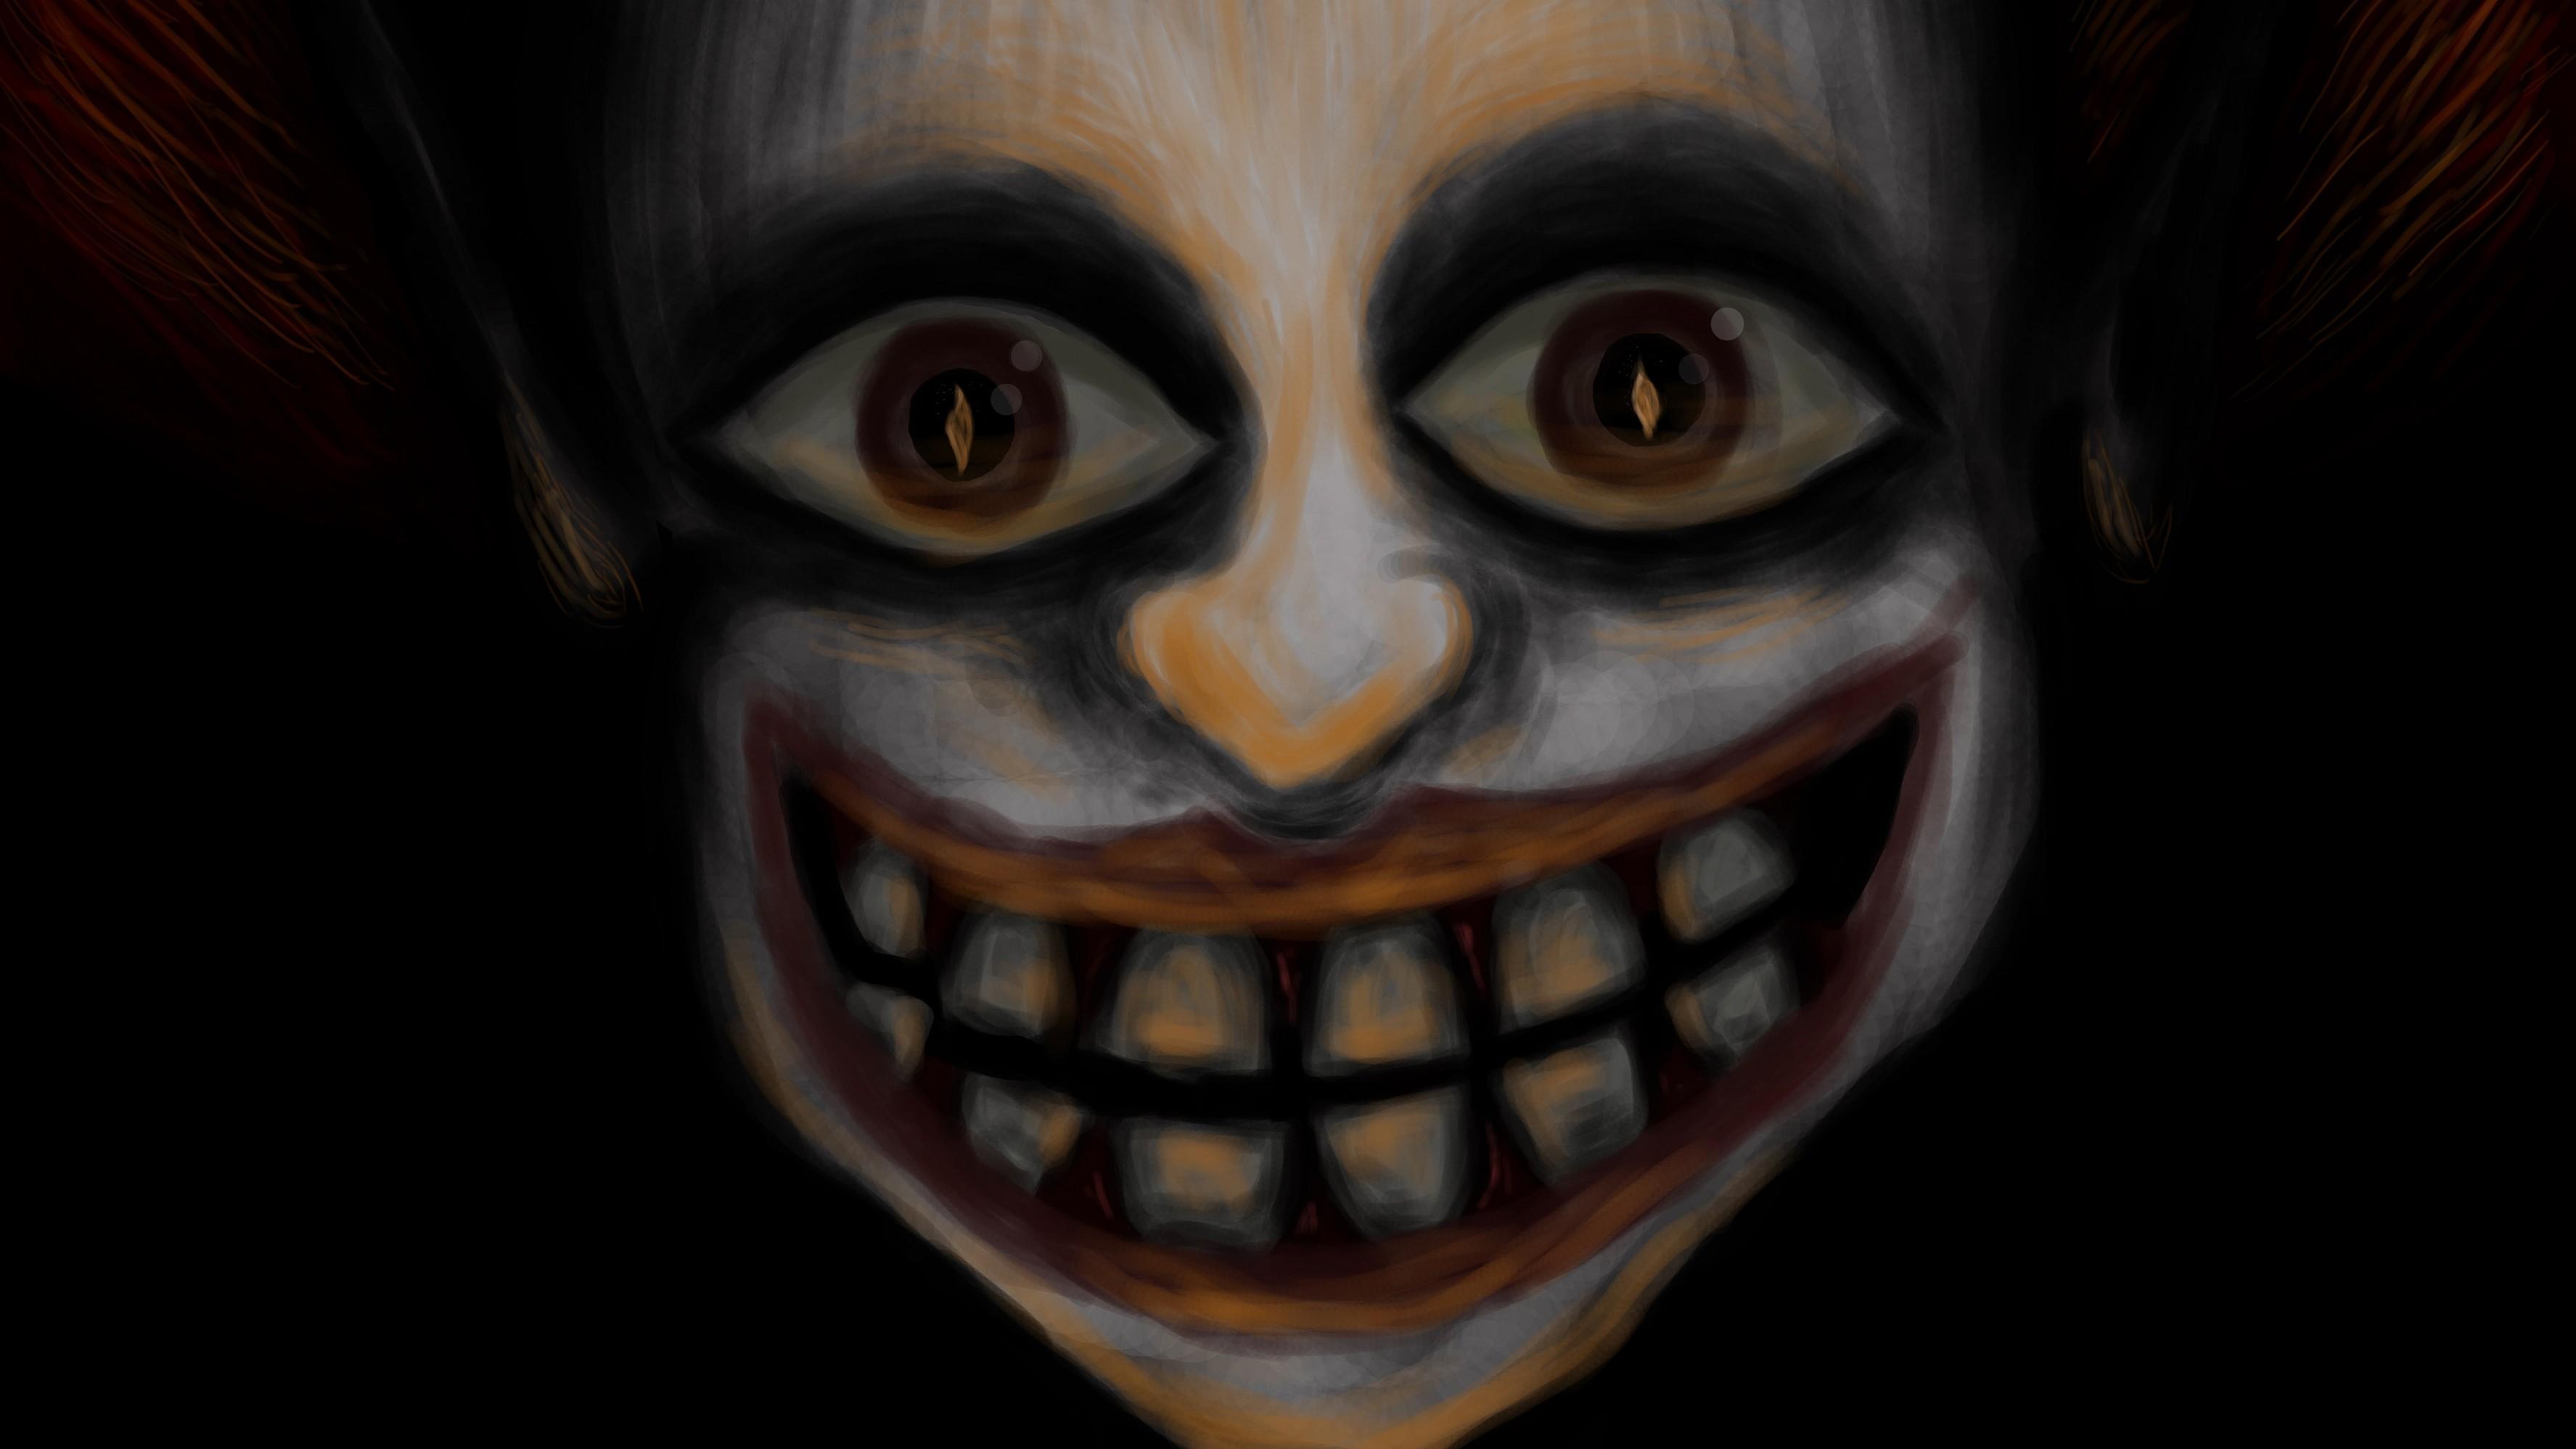 Res: 3550x1997, Dark - Creepy Jeff the Killer Wallpaper